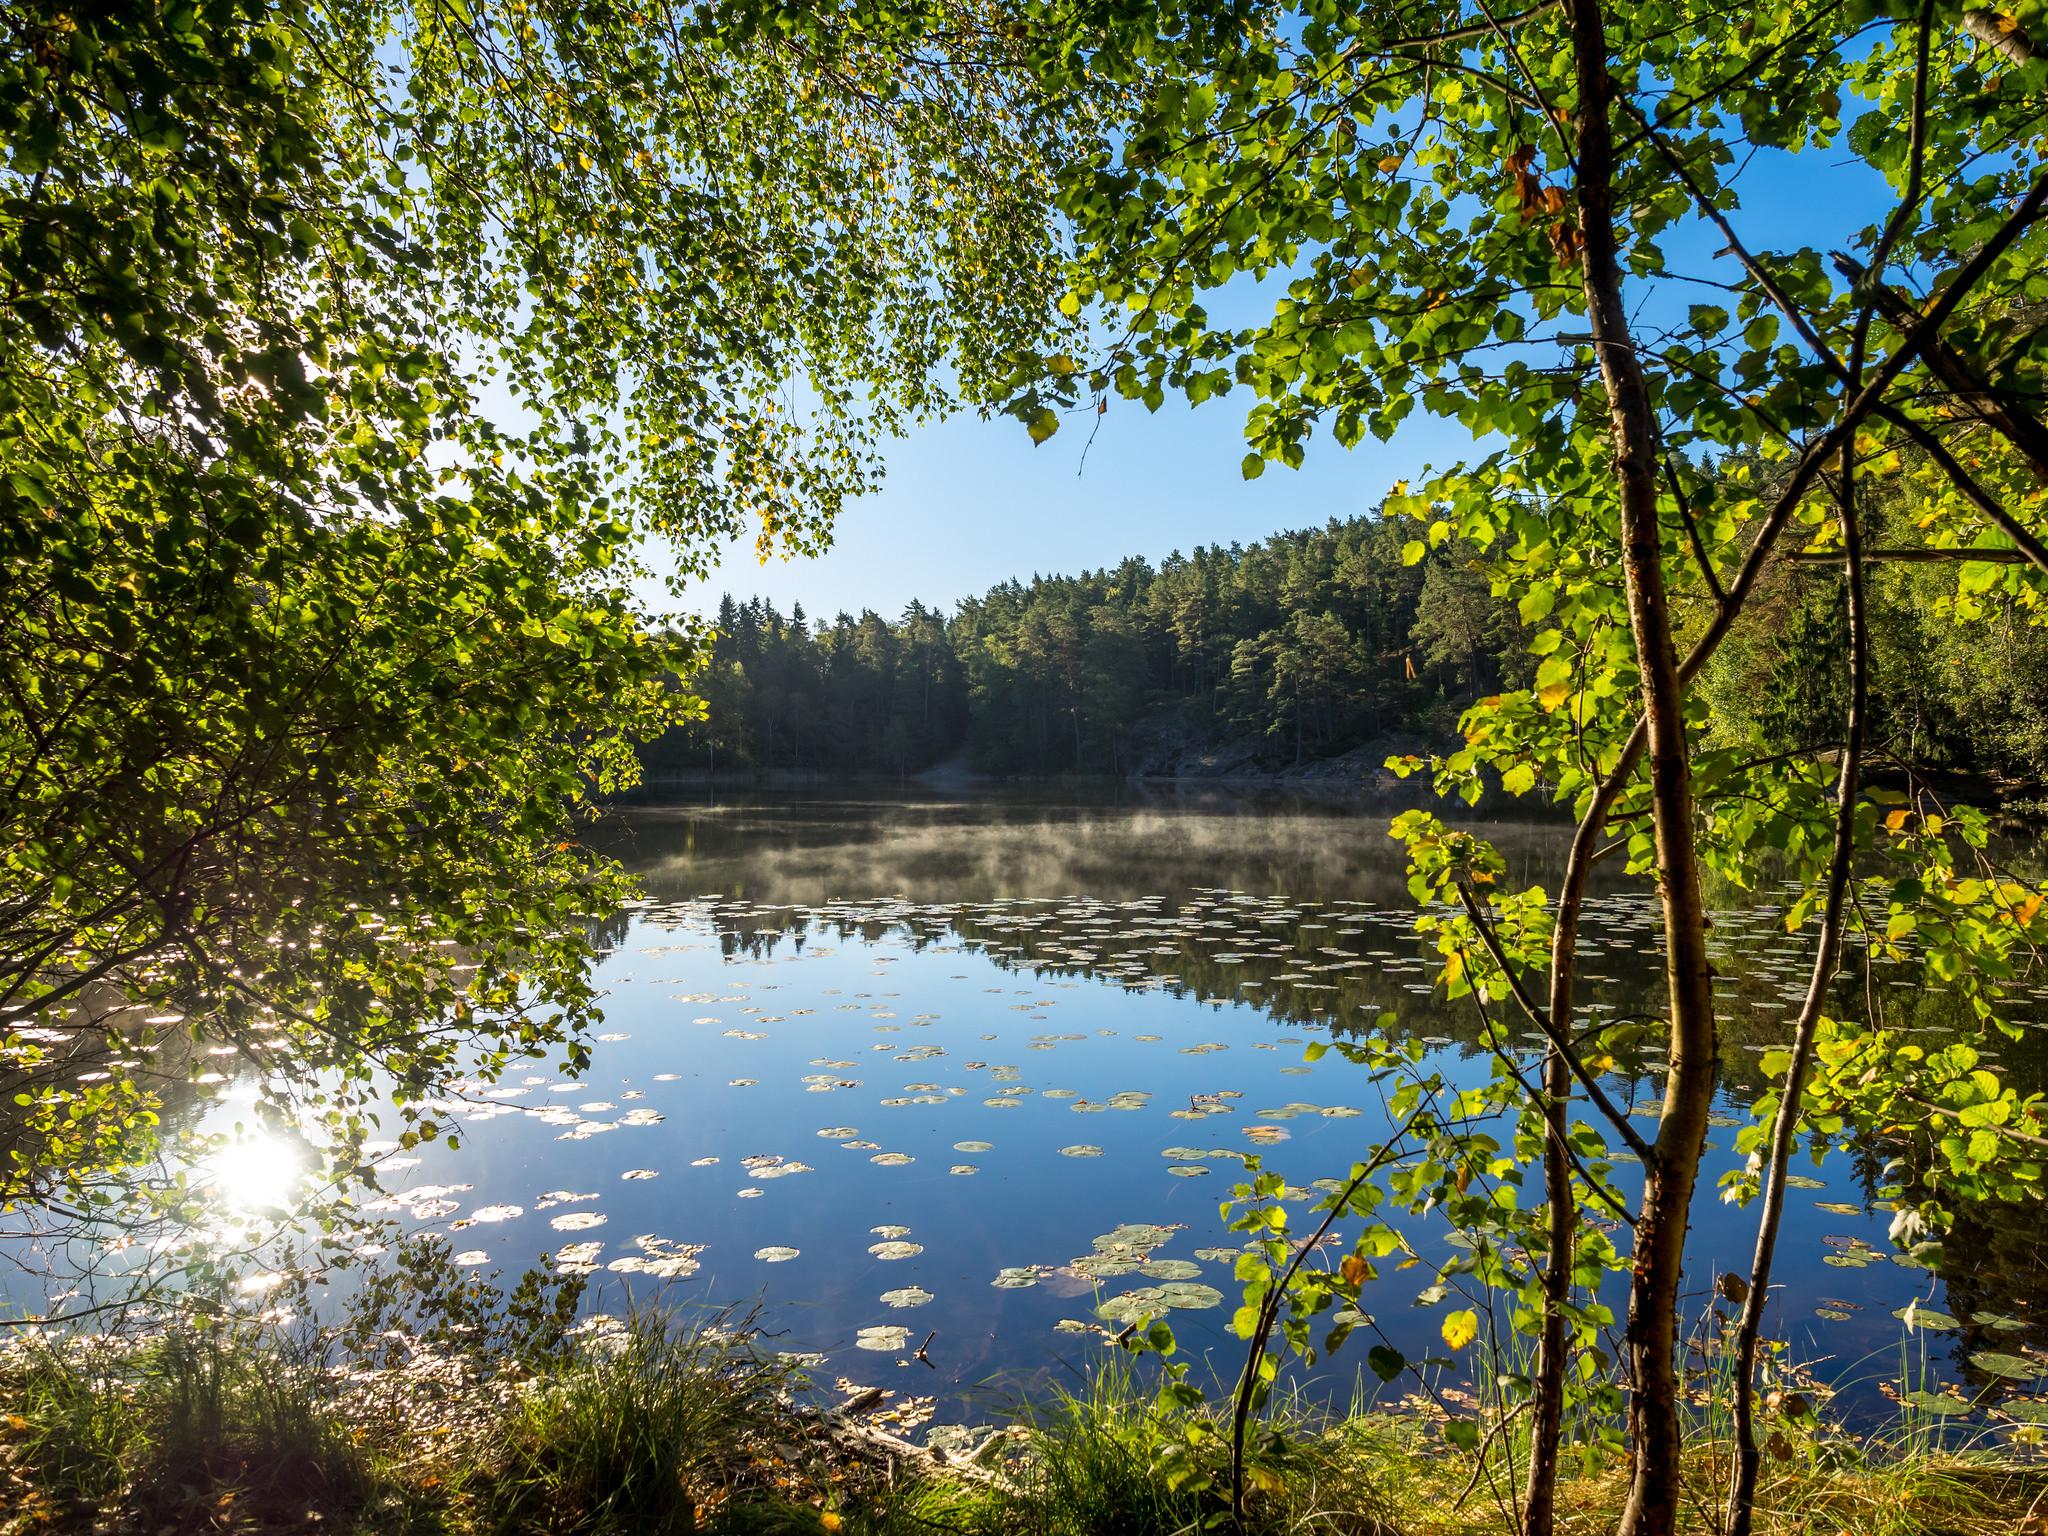 обои озеро, водоём, лес, деревья картинки фото